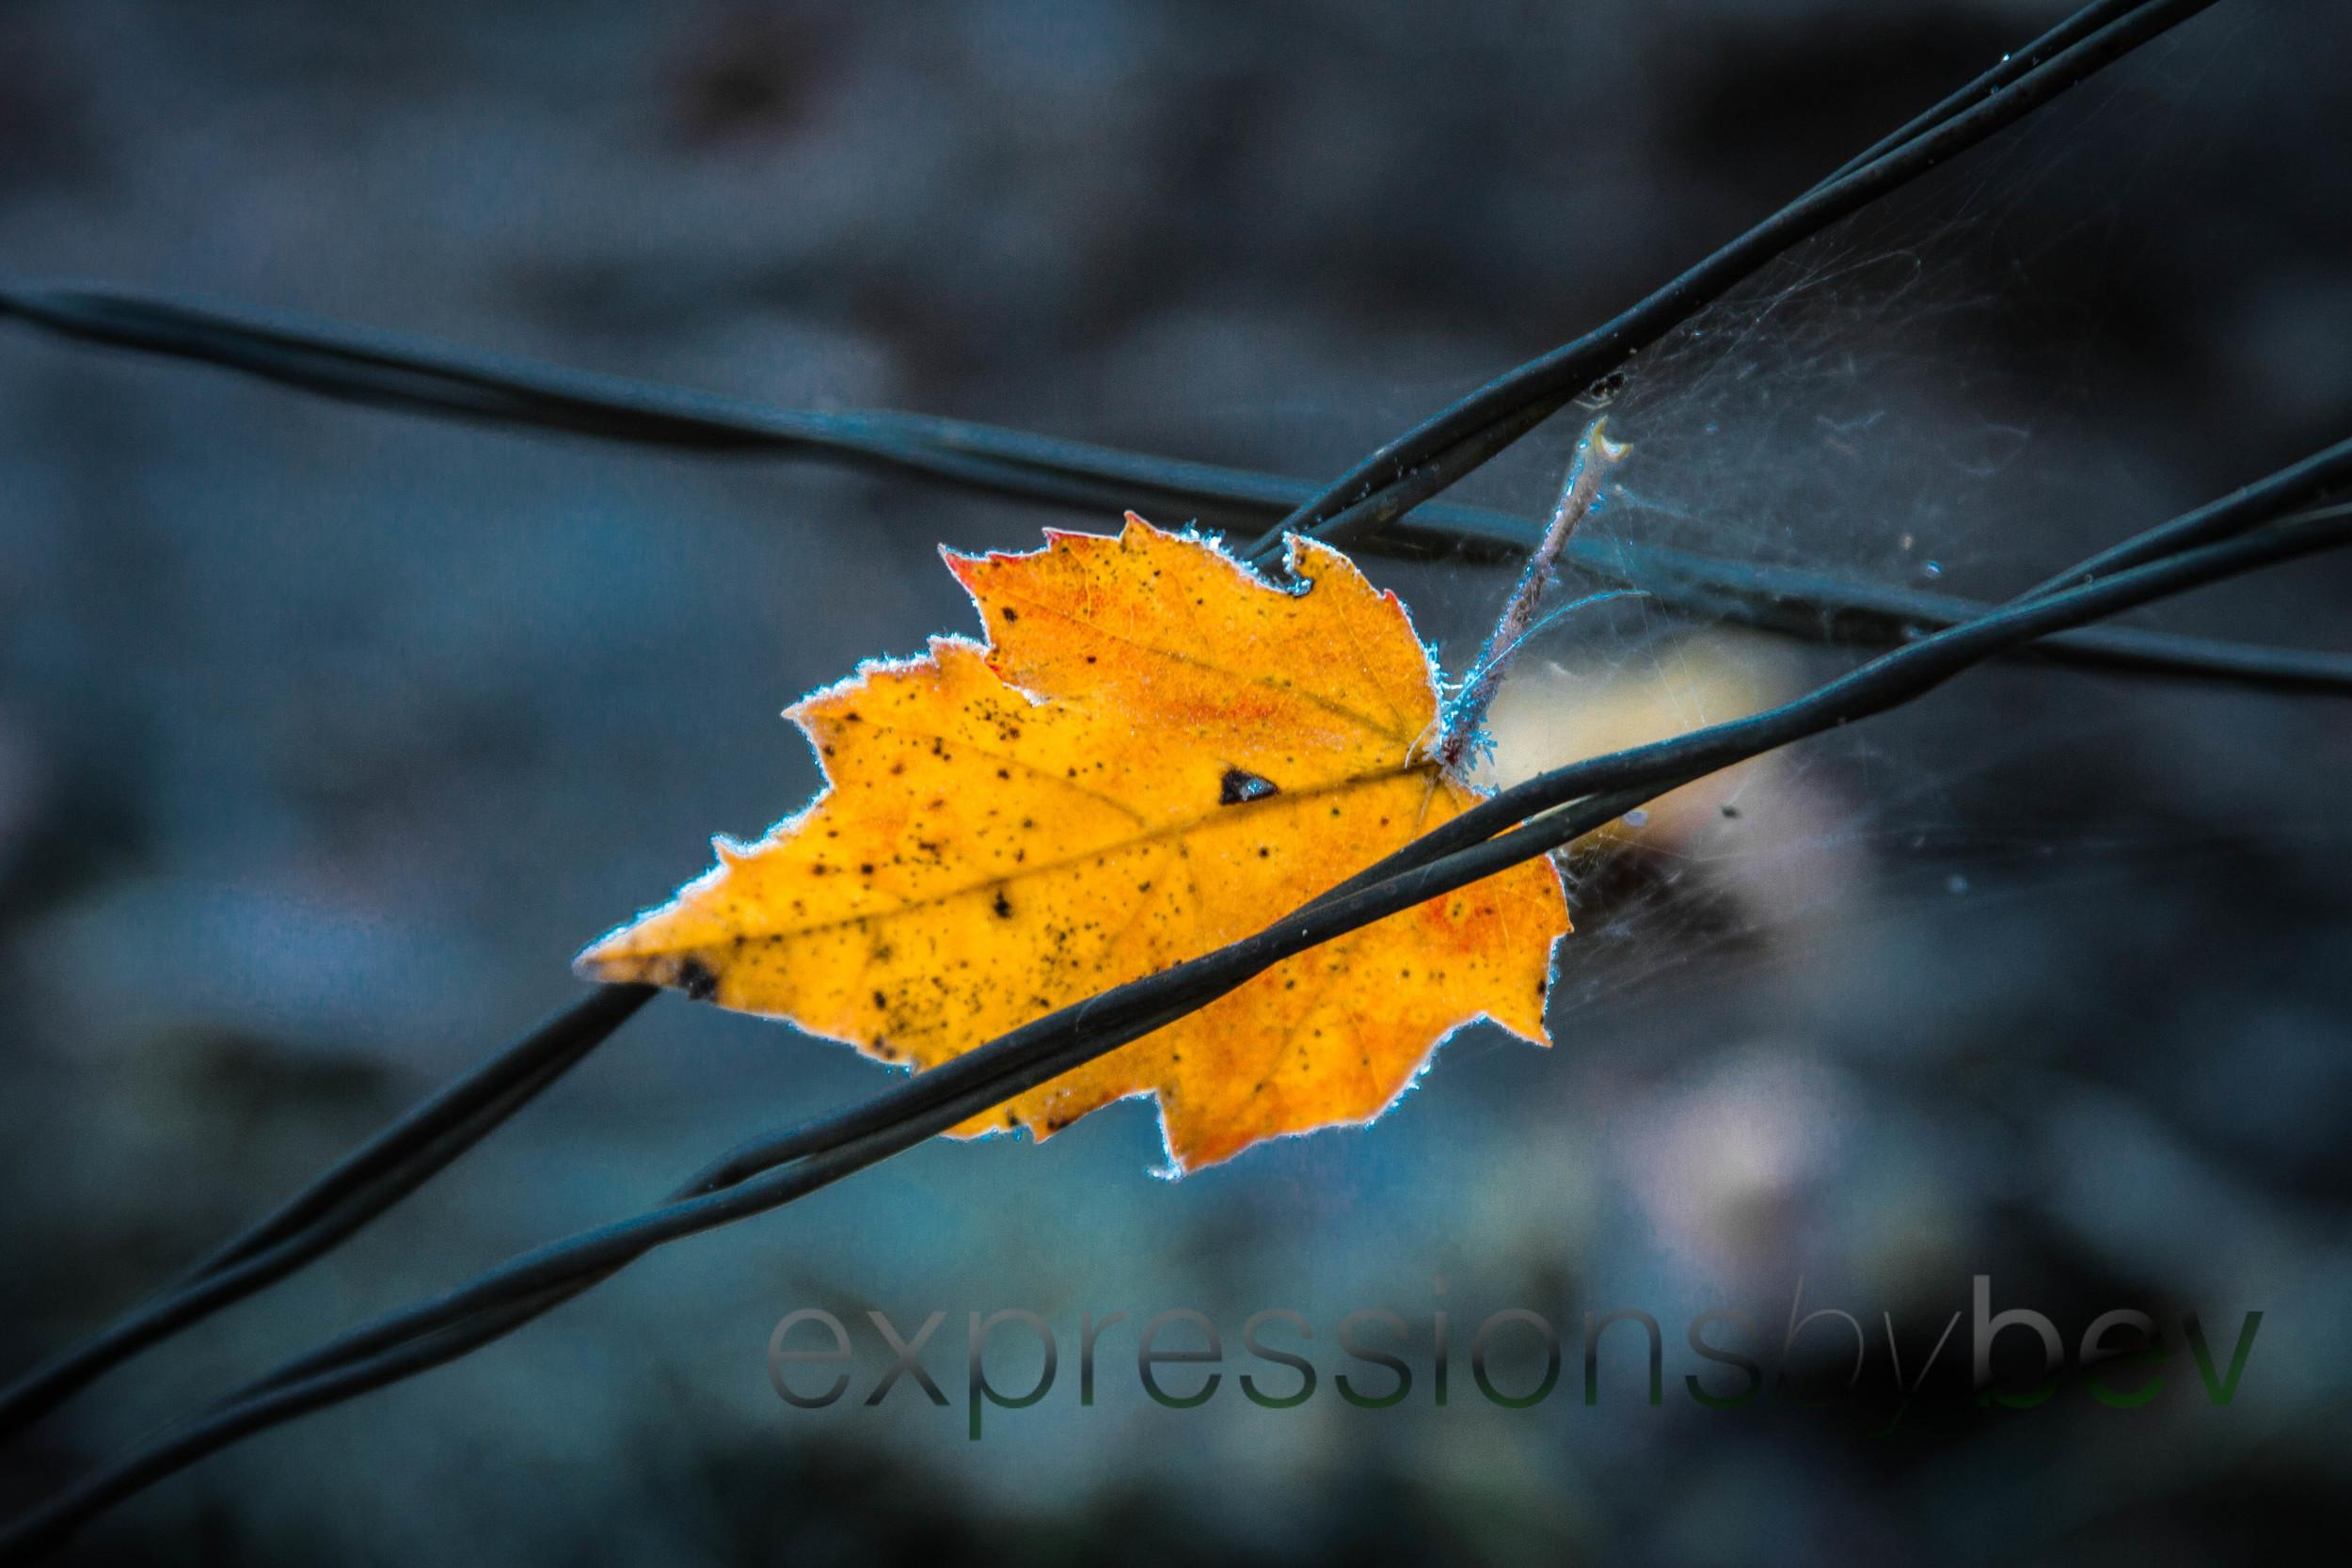 EBBev-2013-CNPA cades cove,treemont,roaring fork,sunrise,frost,spiderwebs,-3530-16_-58.jpg